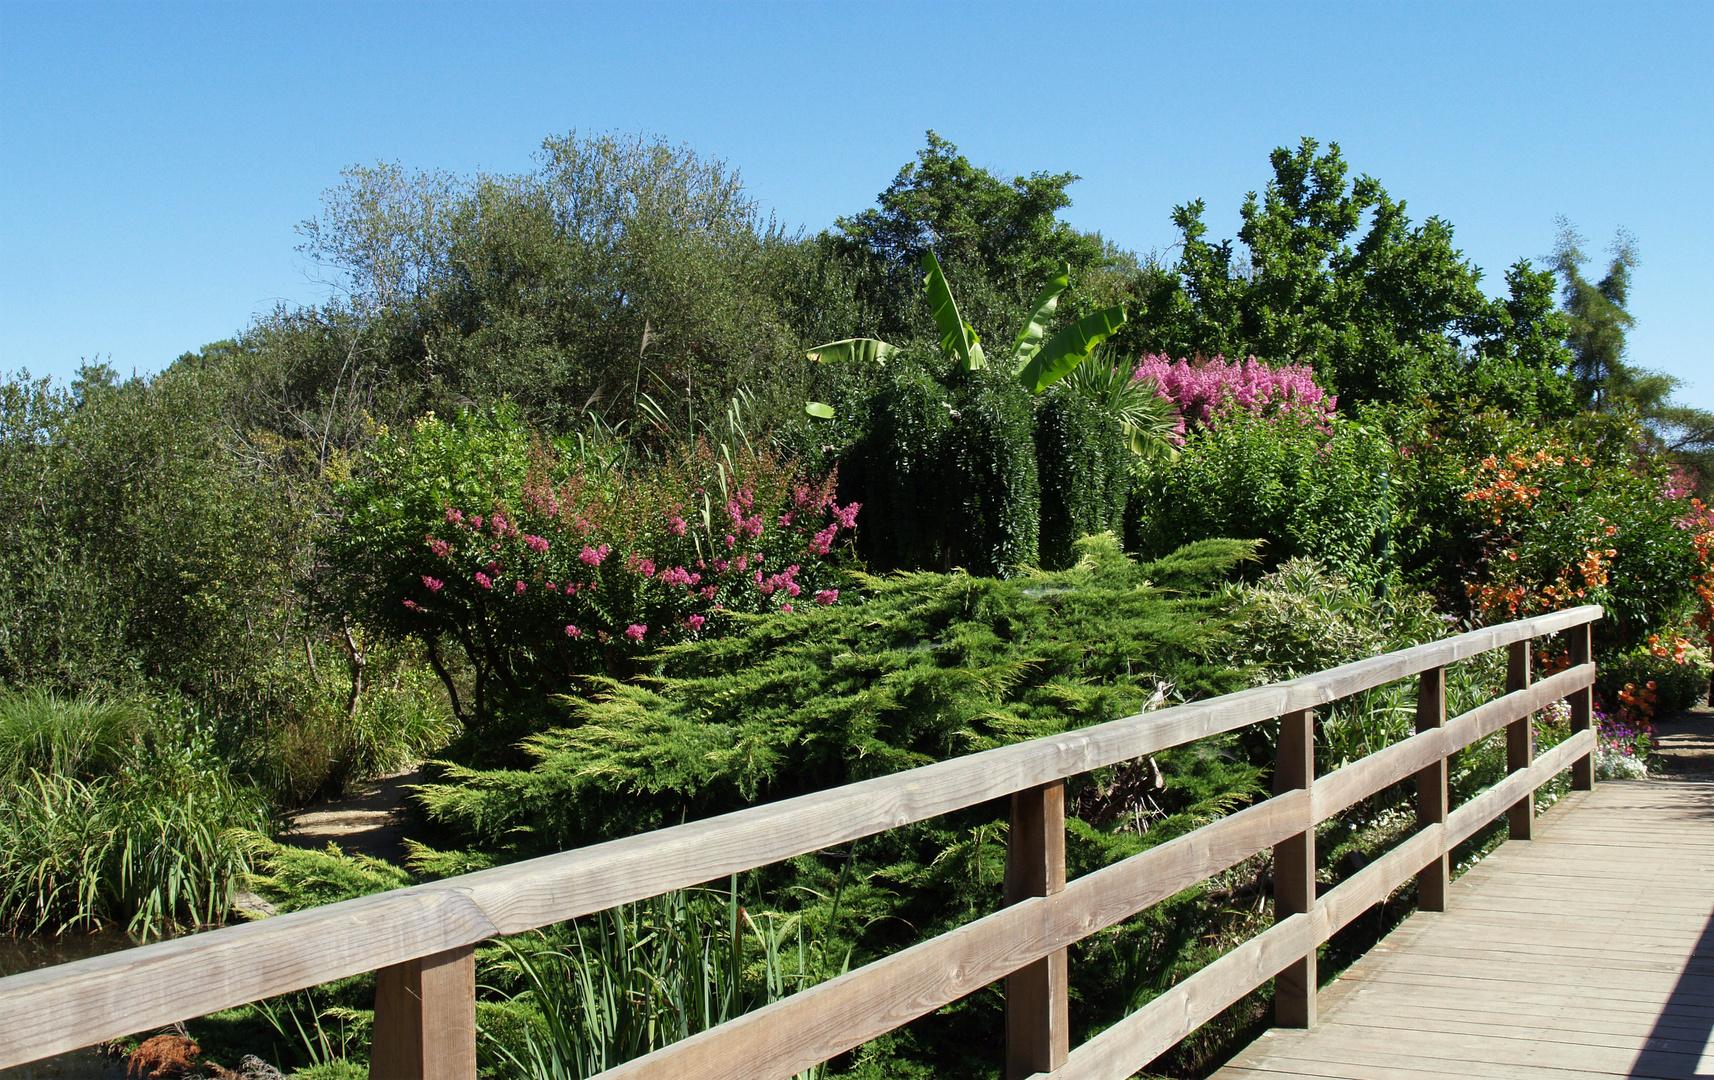 promenade fleurie – mimizan 1 photo et image | jardins, landes